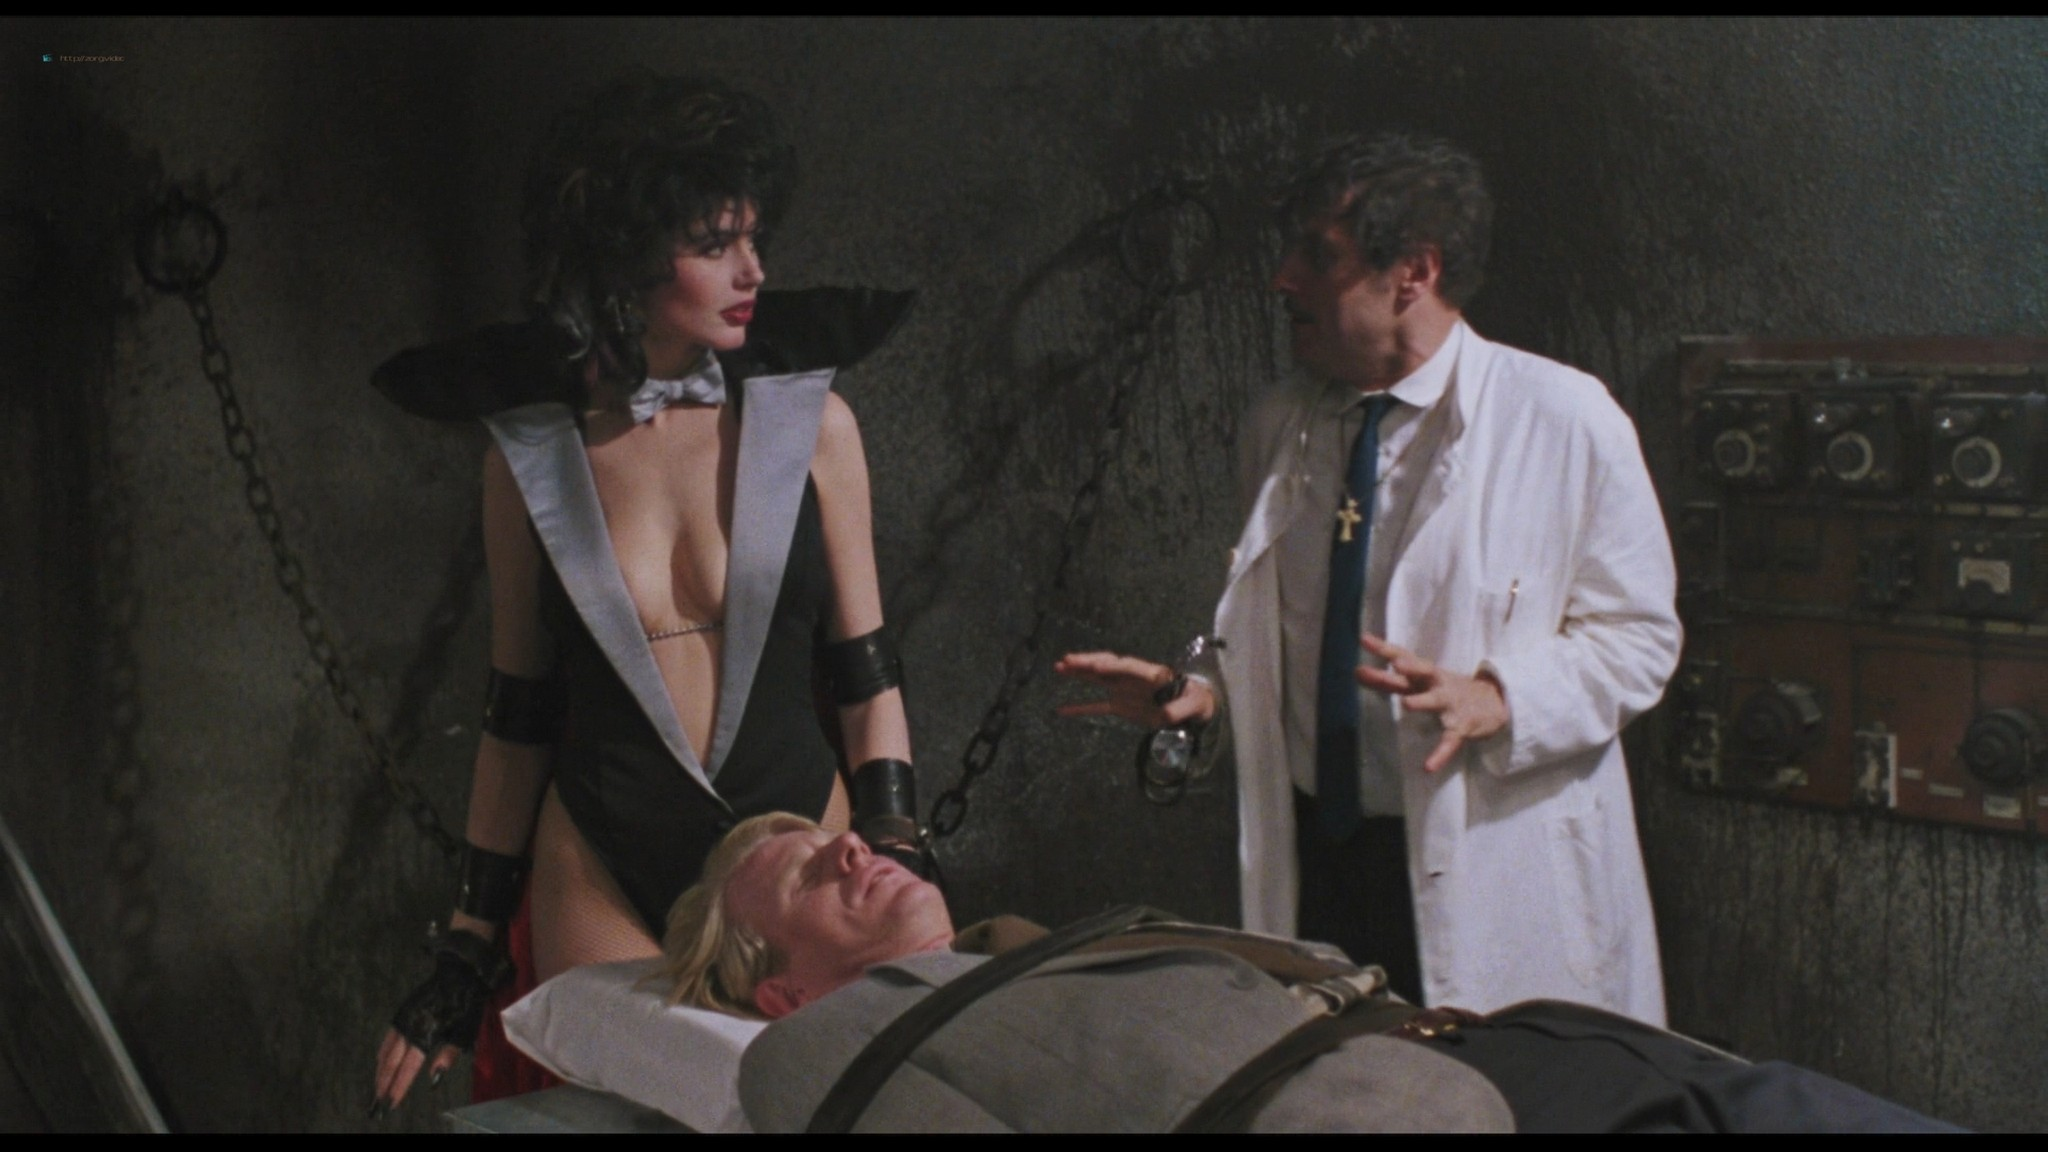 Geena Davis hot and sexy Ksenia Prohaska sexy - Transylvania 6-5000 (1985) HD 1080p BluRay (8)